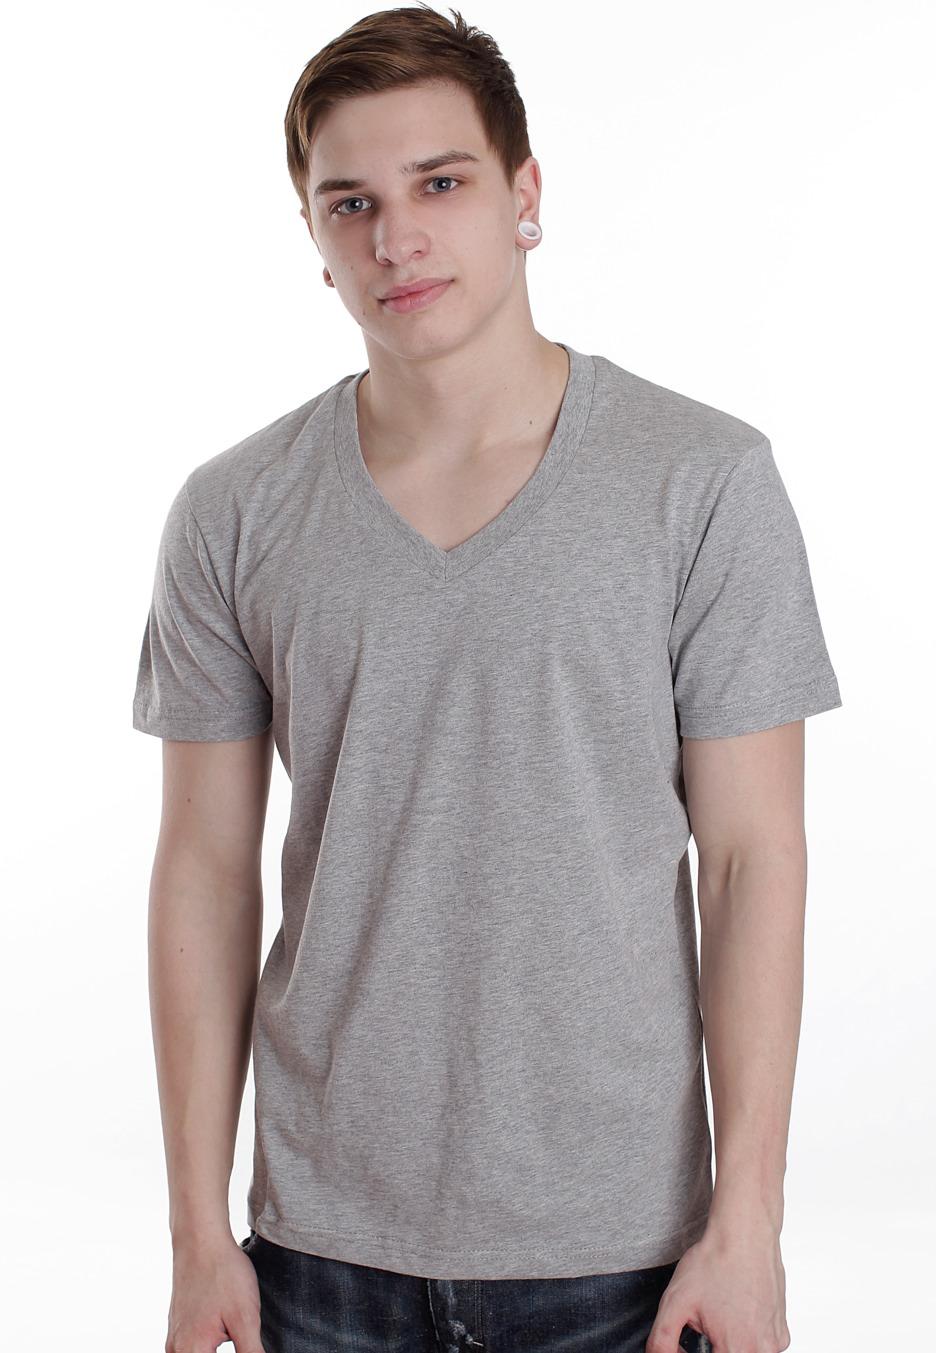 Urban Classics - Basic Grey - V Neck T-Shirt - Streetwear Online Shop - Online Shop - Impericon.com